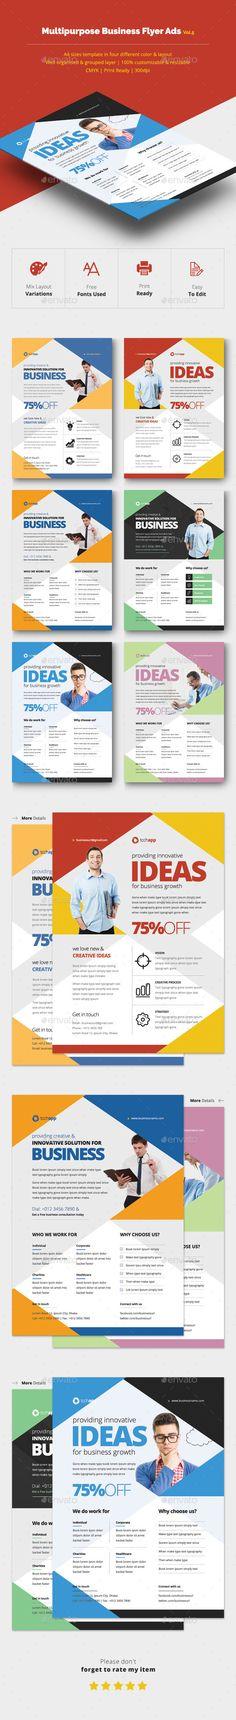 Multipurpose Business Flyer Template PSD #design Download: http://graphicriver.net/item/multipurpose-business-flyer-vol5/14200781?ref=ksioks